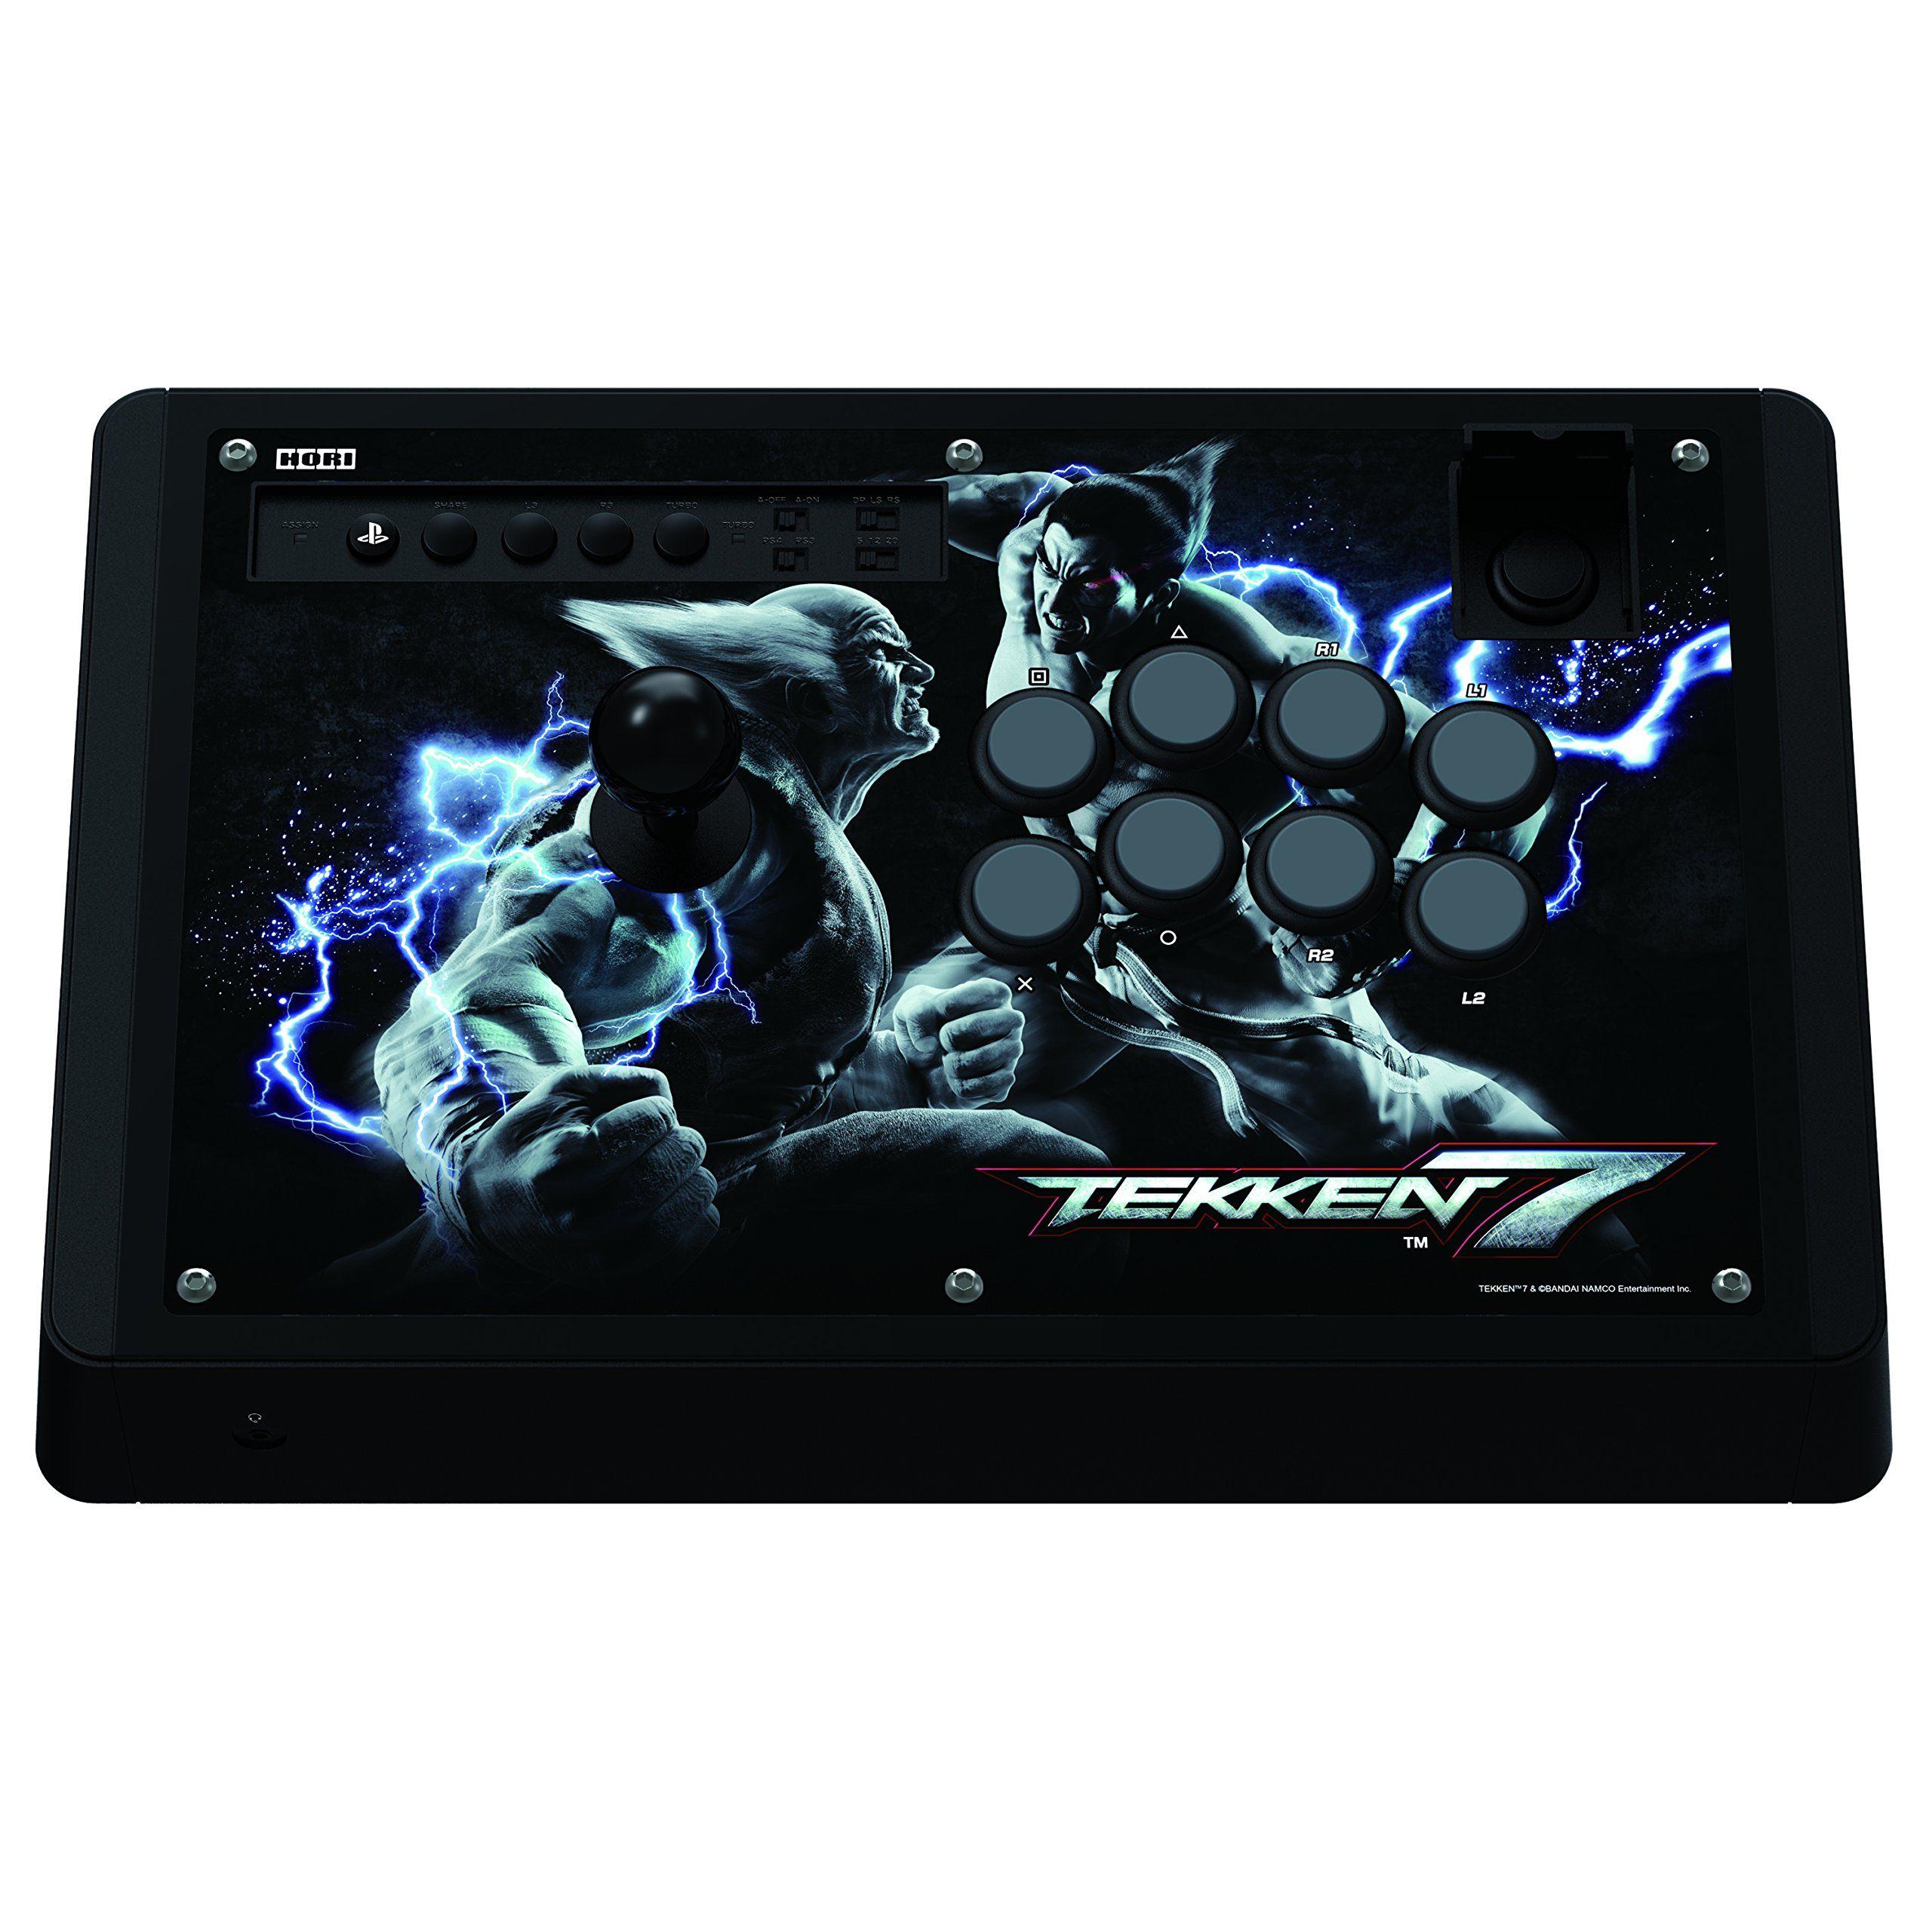 HORI Real Arcade Pro 4 Kai Tekken 7 Edition Fight Stick for